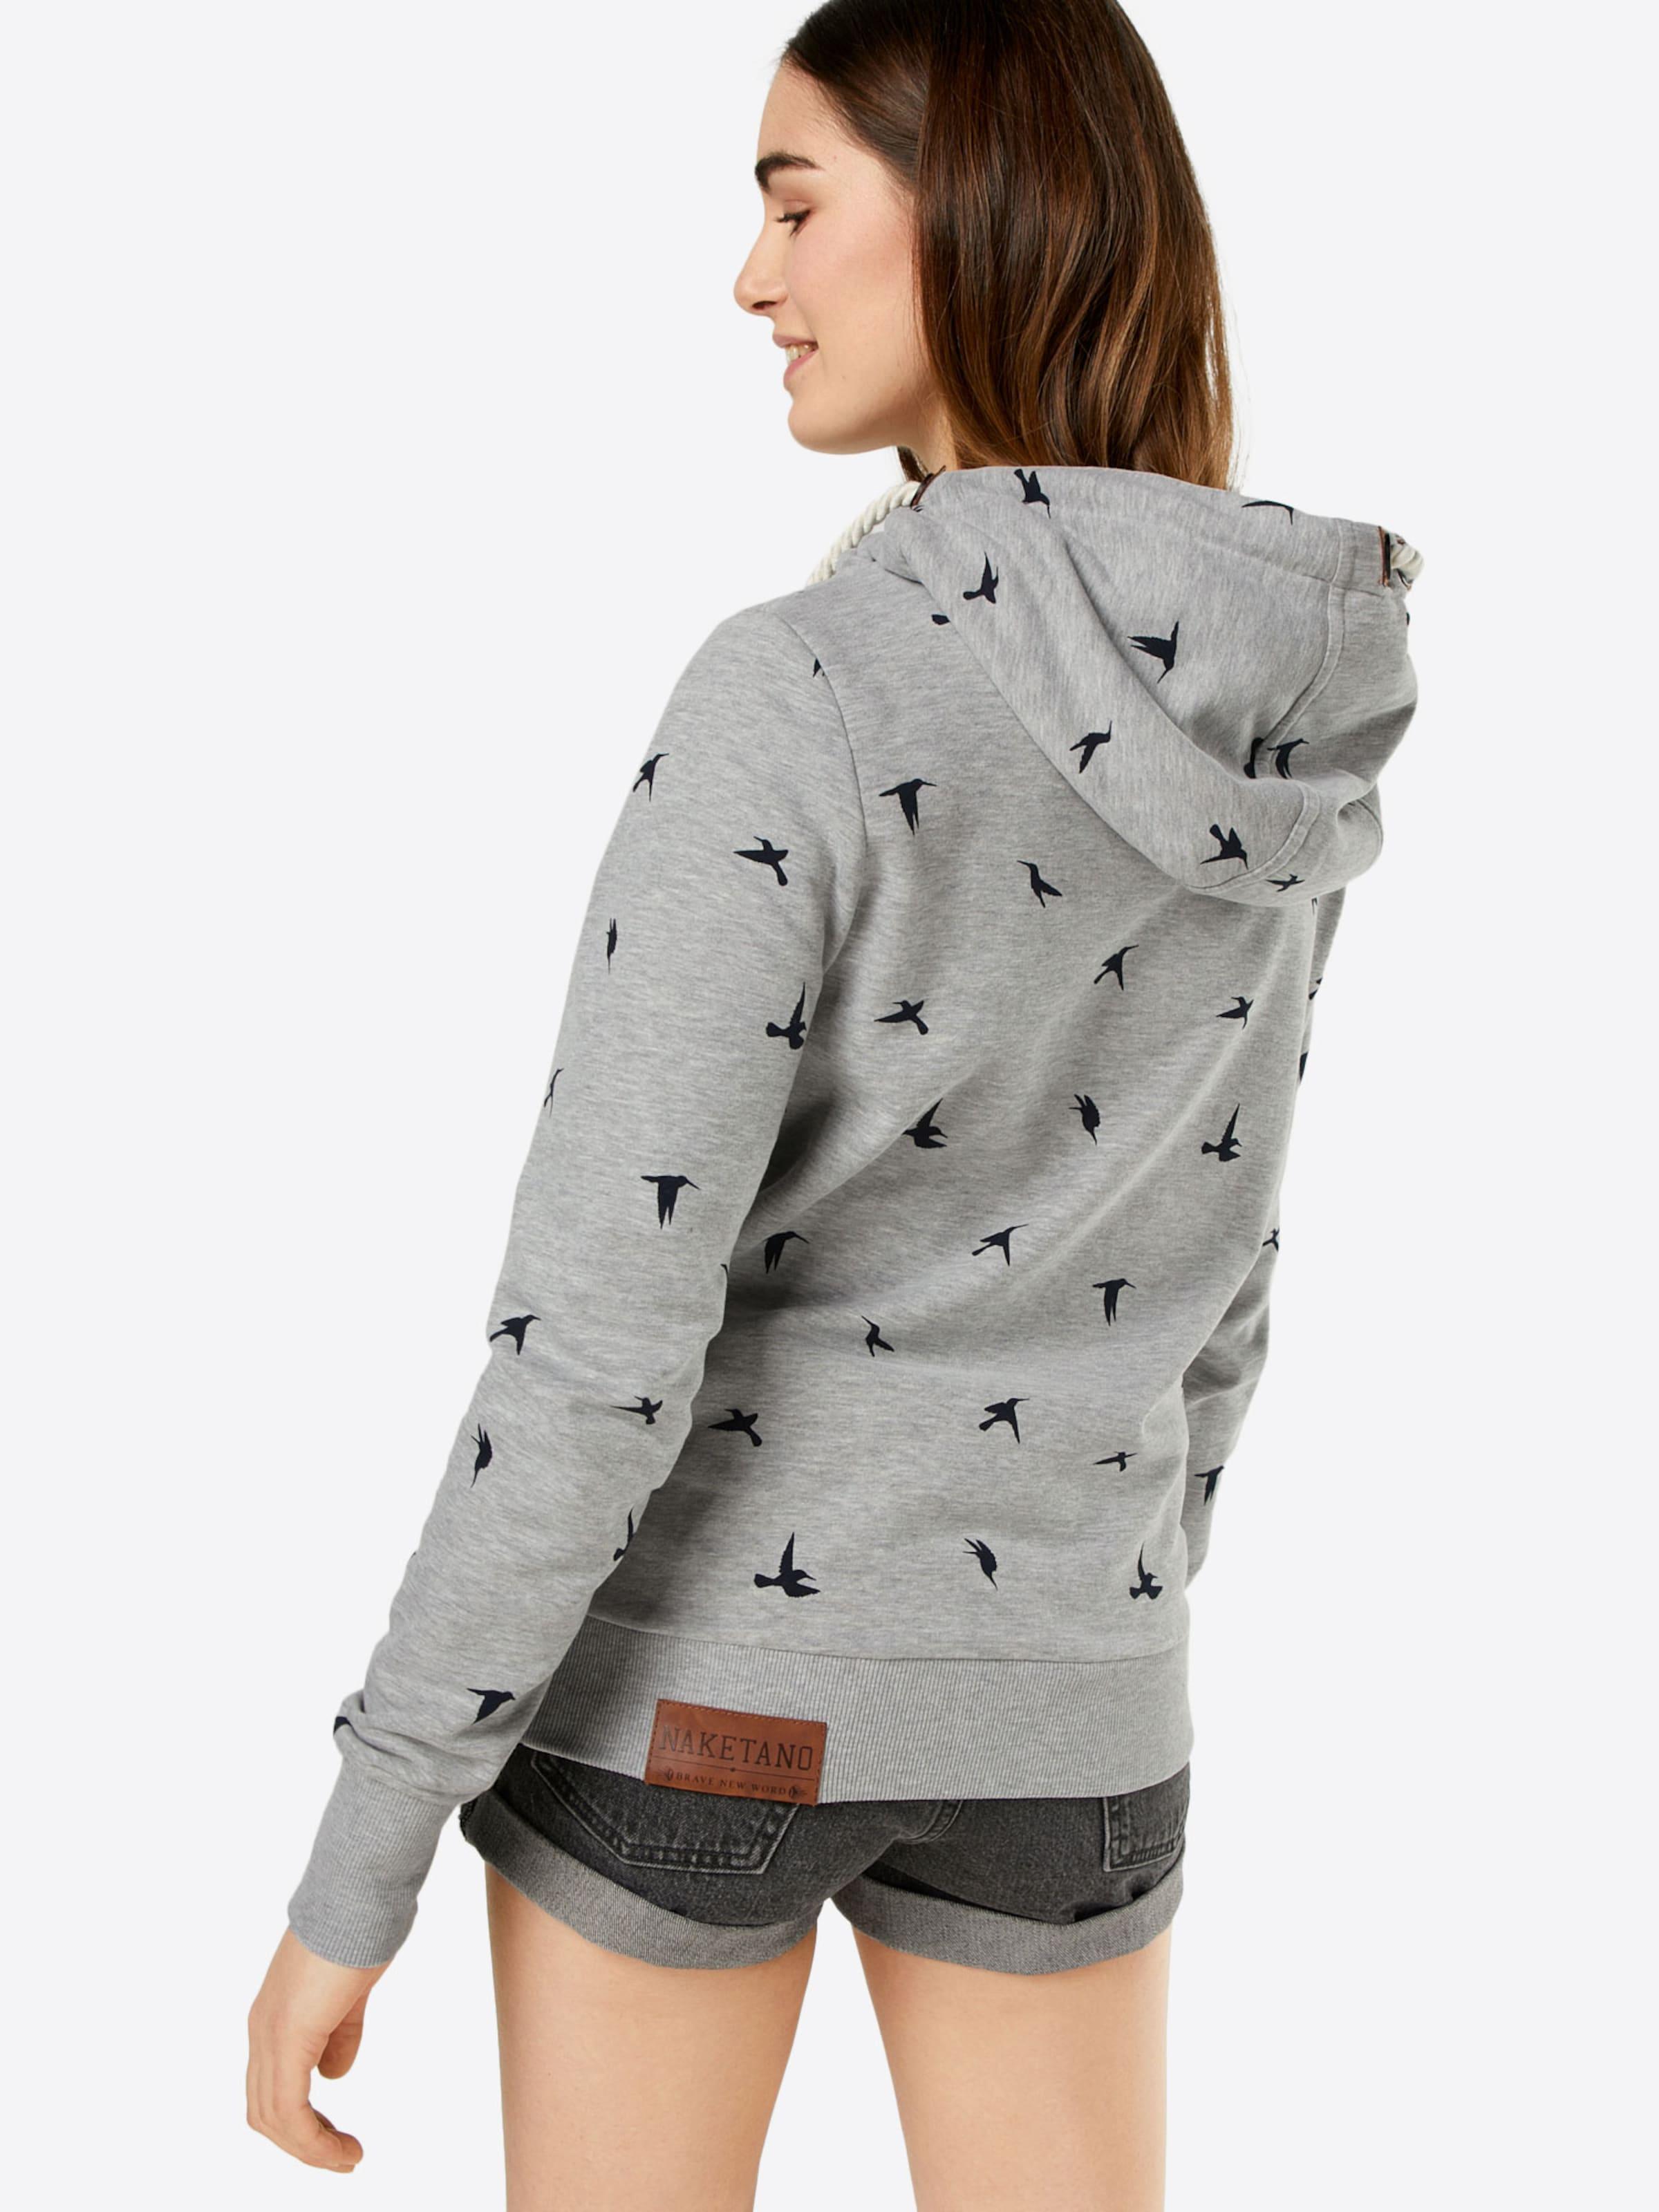 En For Gris Naketano 'go Sweat ClairNoir shirt The Gap' 9ID2EHYW